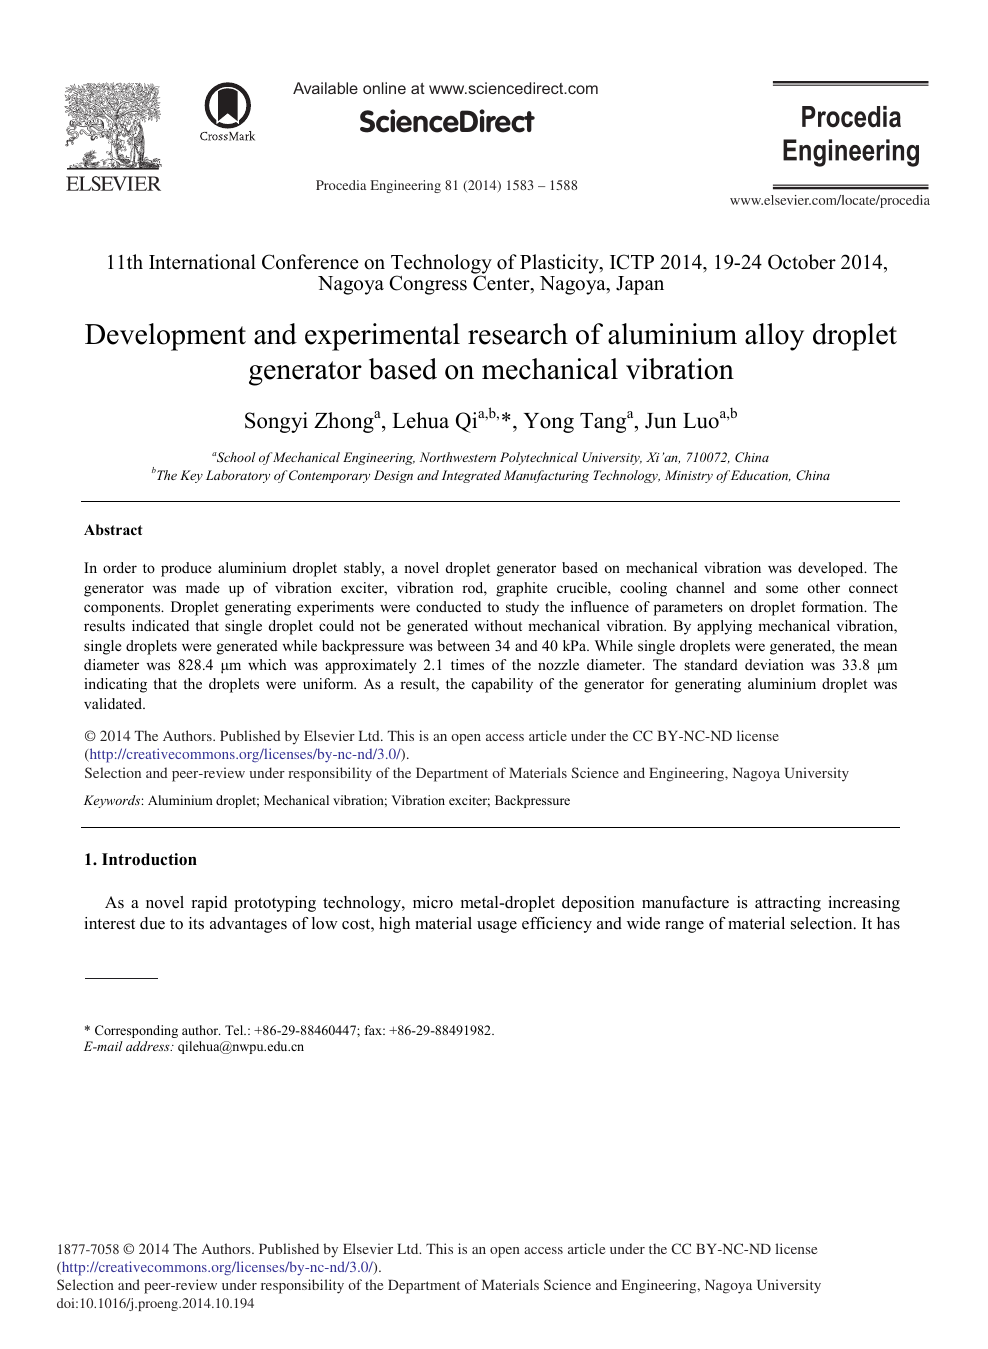 Development and Experimental Research of Aluminium Alloy